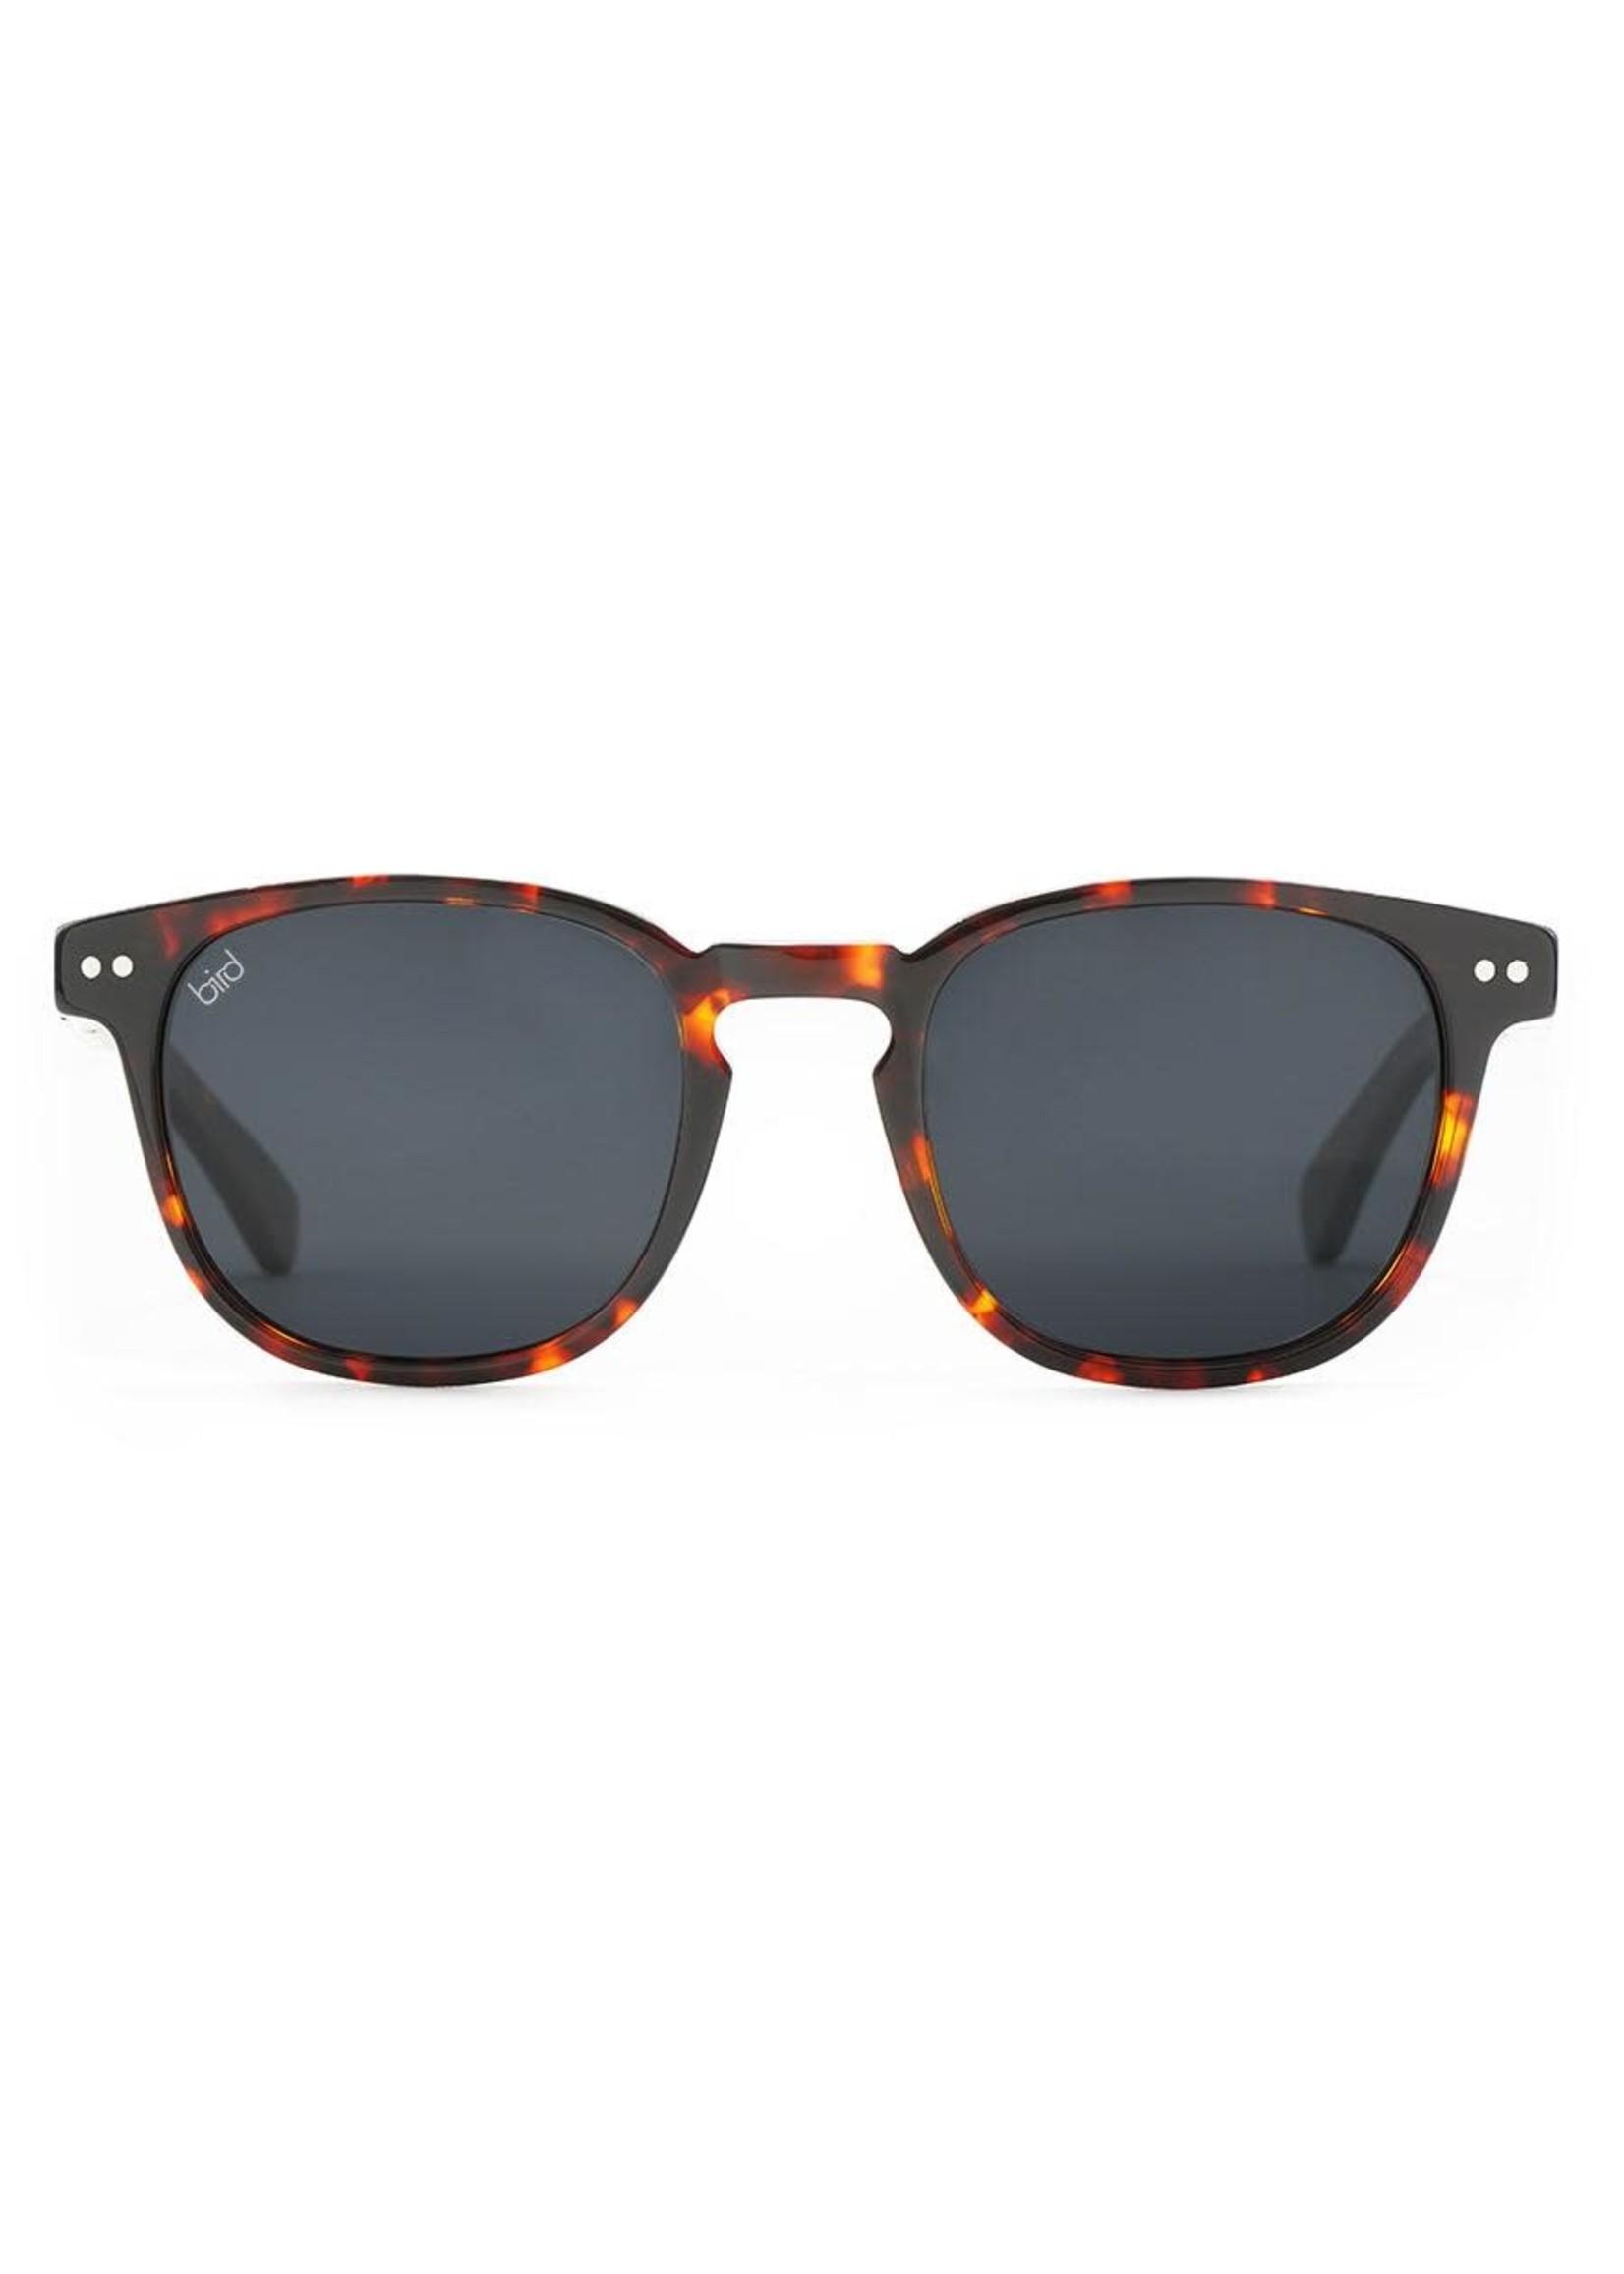 Bird Eyewear Bird Athene Sunglasses - Tortoiseshell